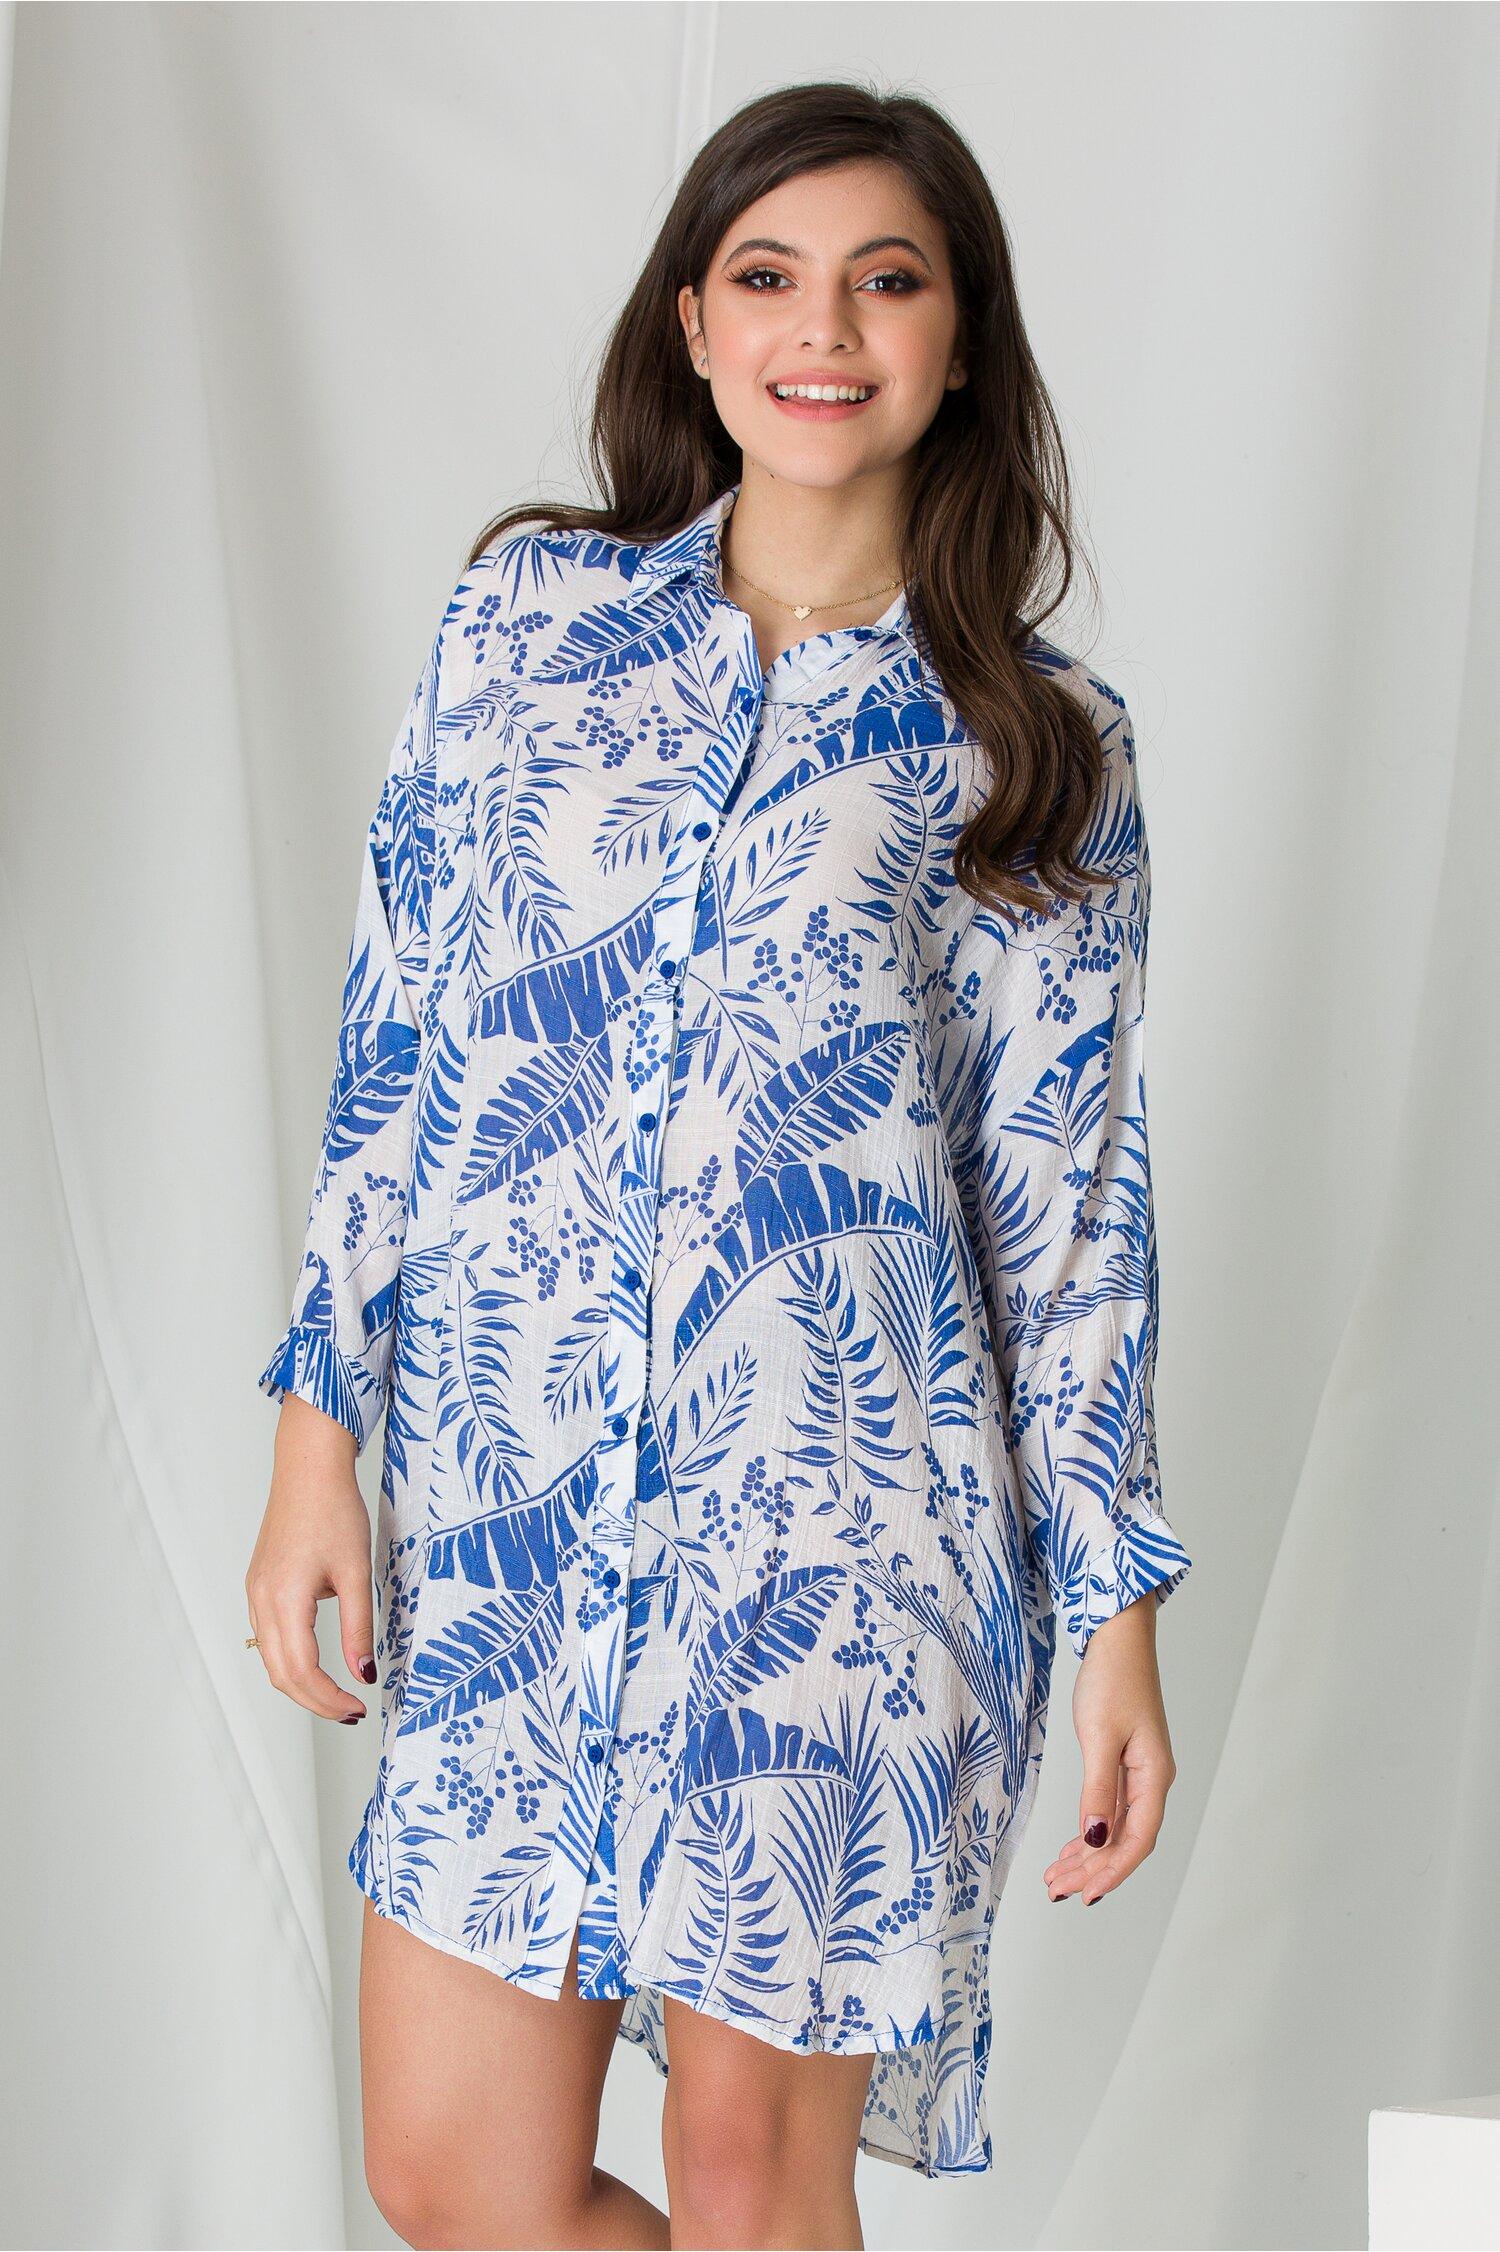 Camasa lunga alba cu imprimeuri albastre